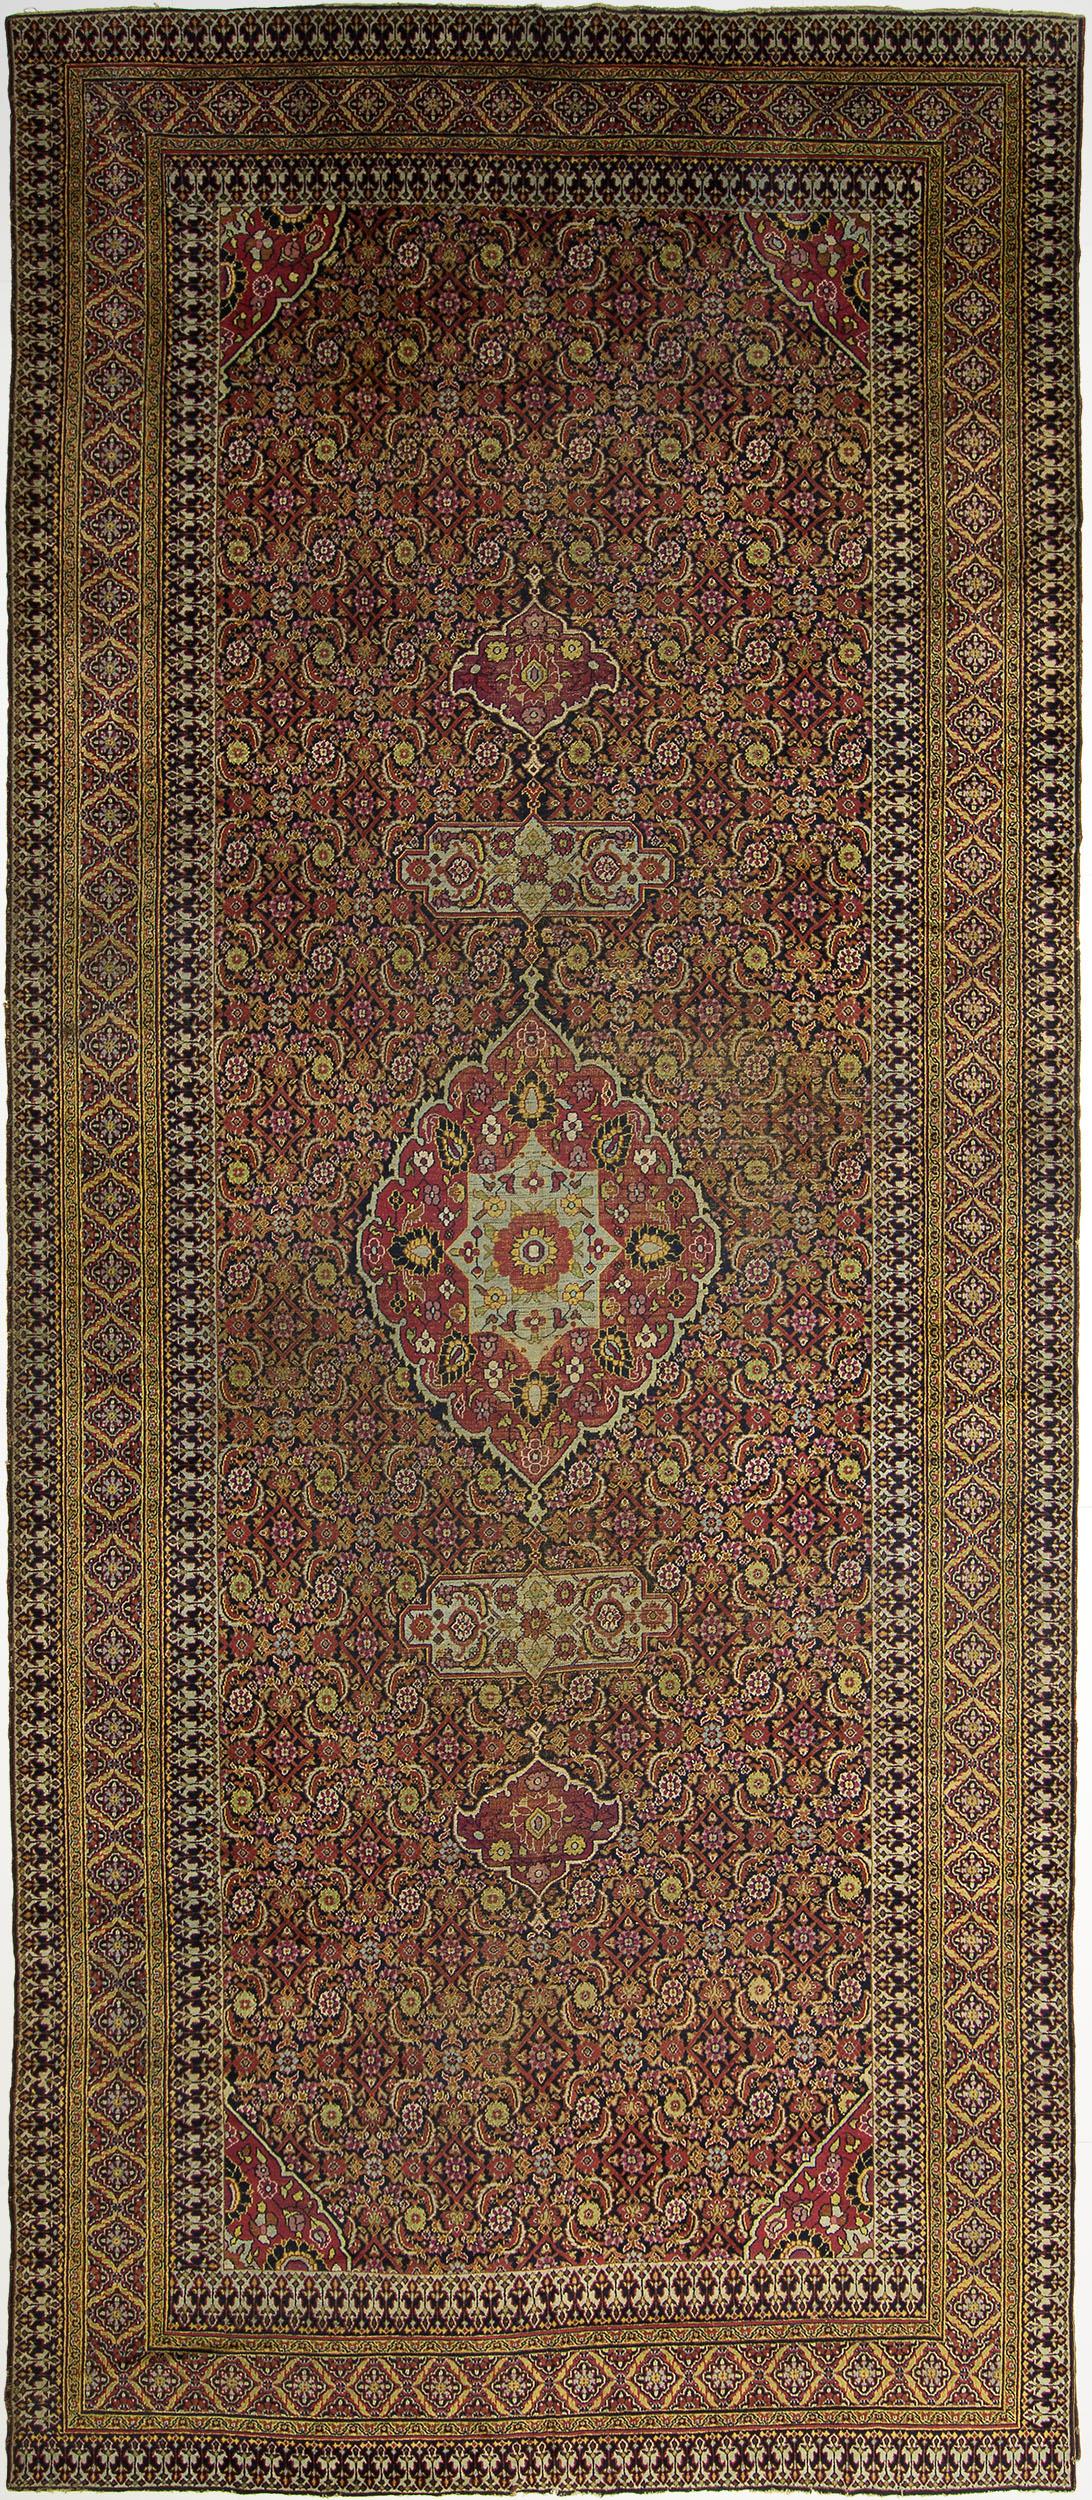 "Khorassan Gallery Carpet 19' 7"" x 8' 0"""